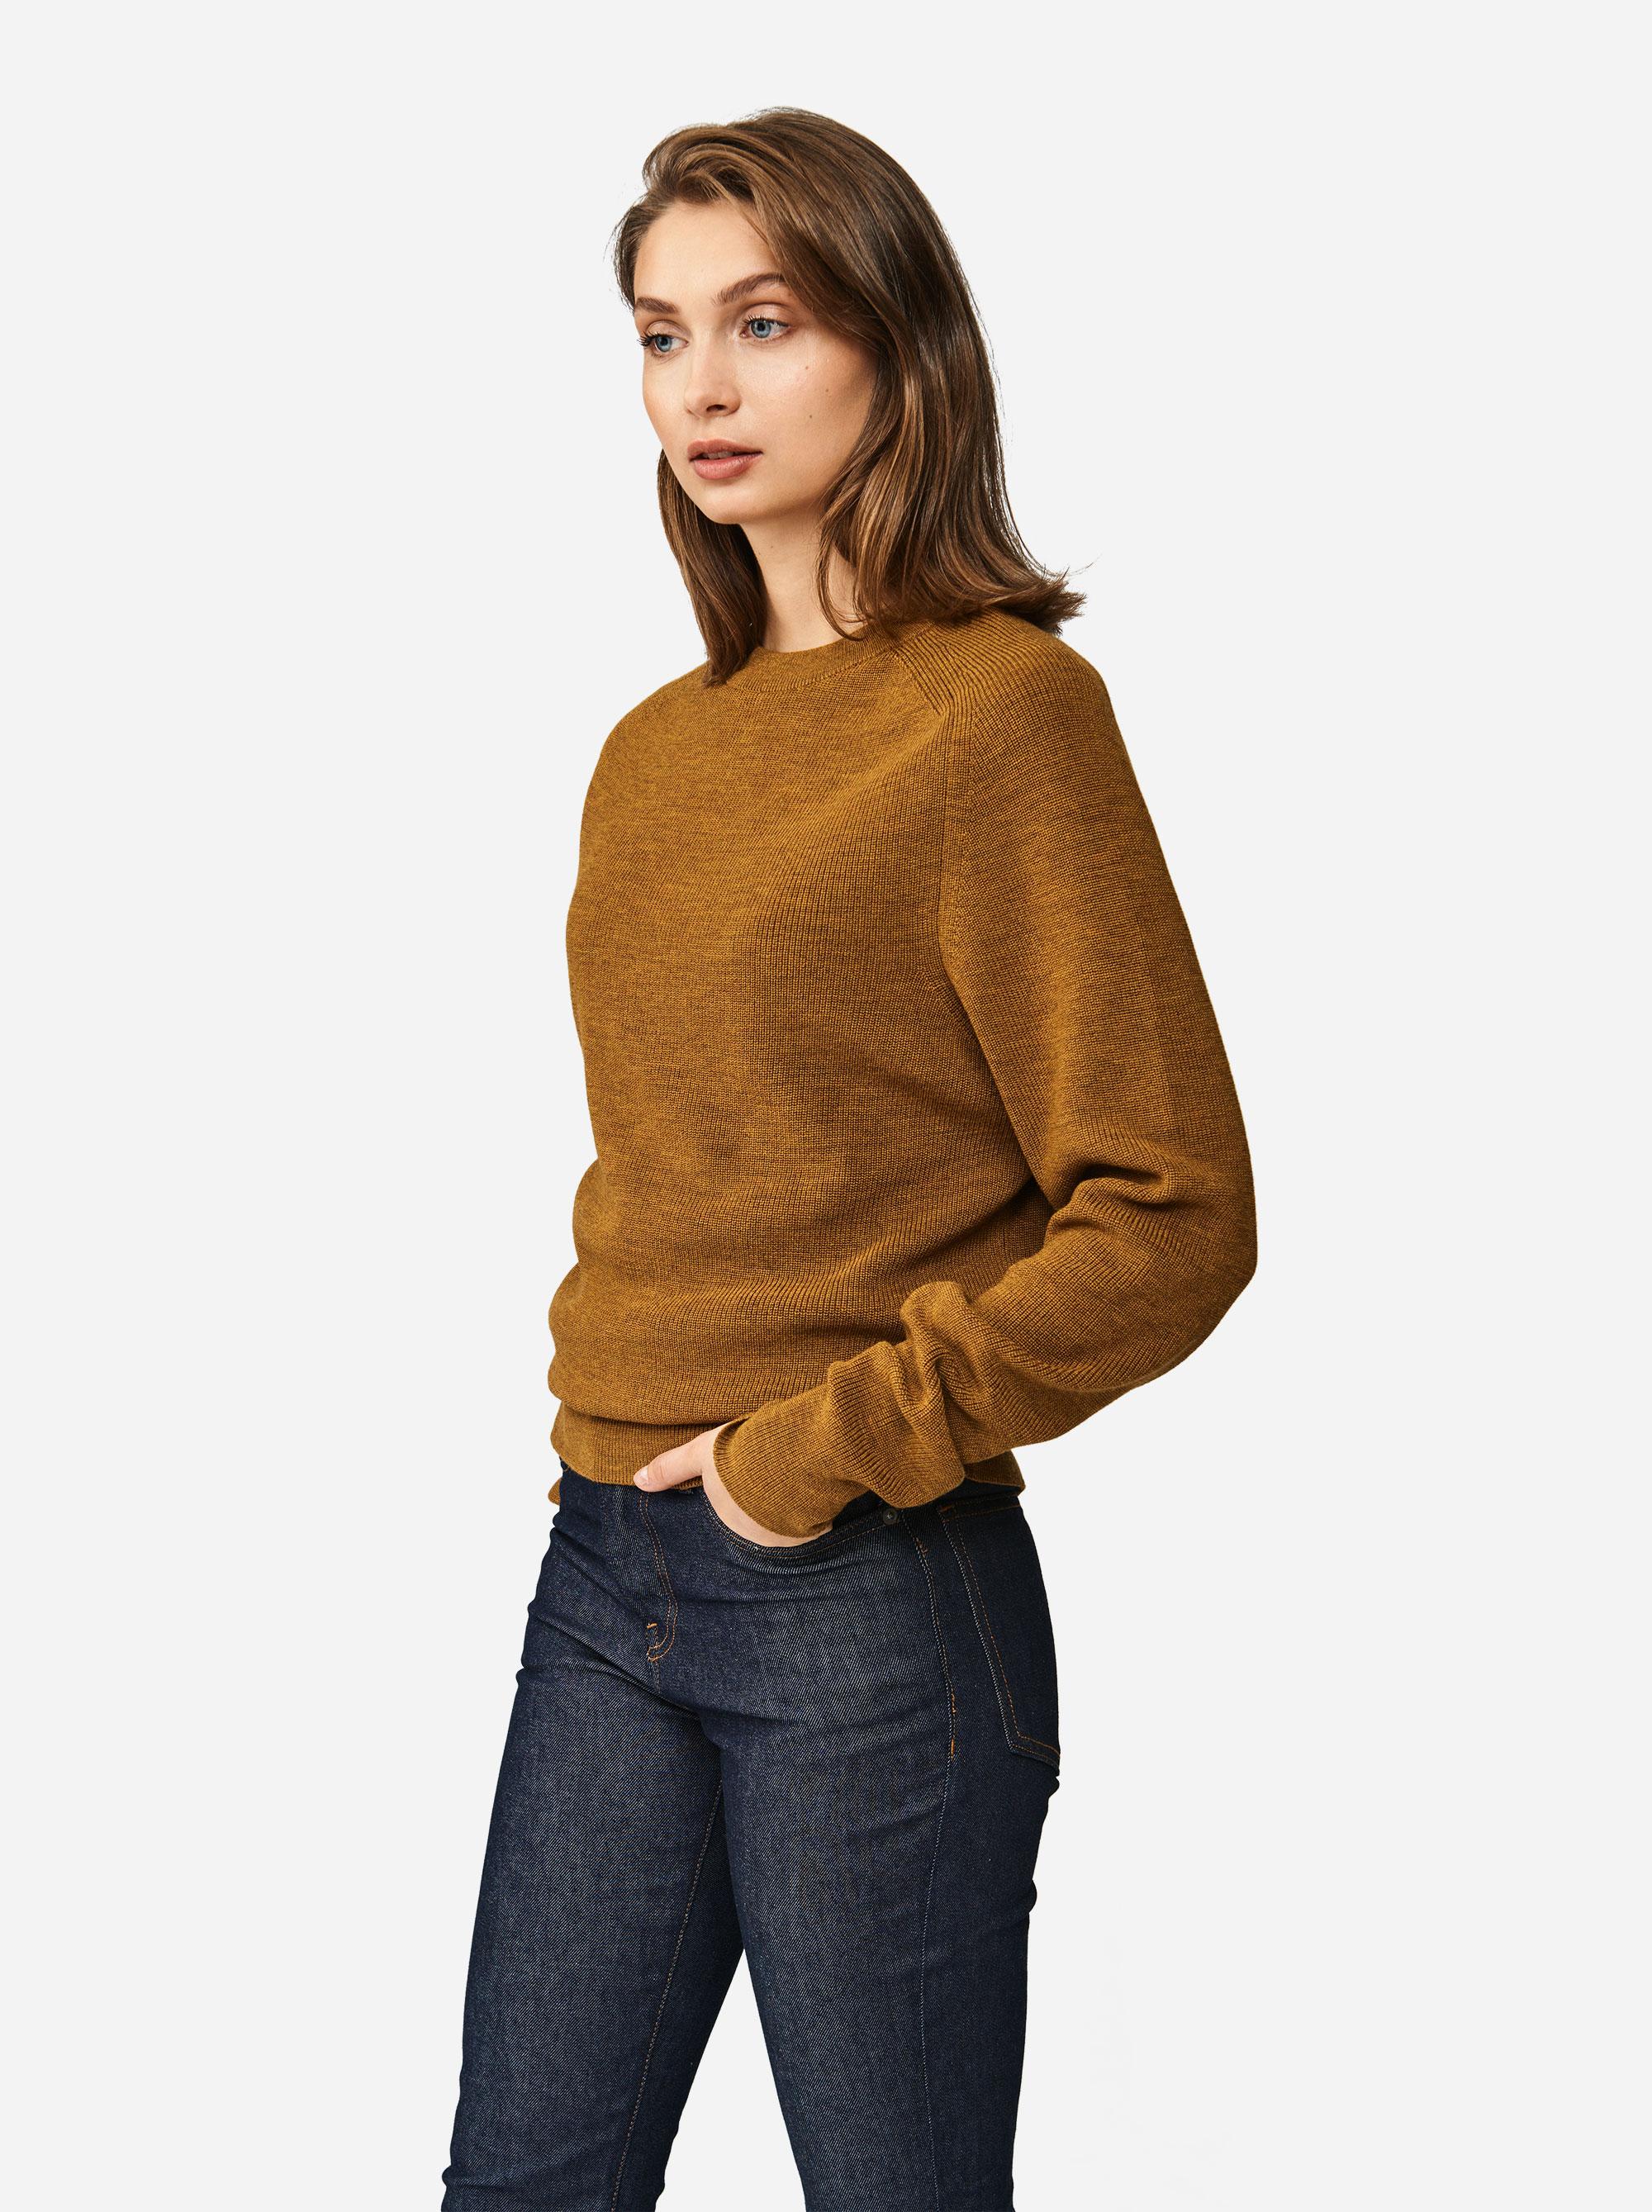 Teym - Crewneck - The Merino Sweater - Women - Mustard - 1